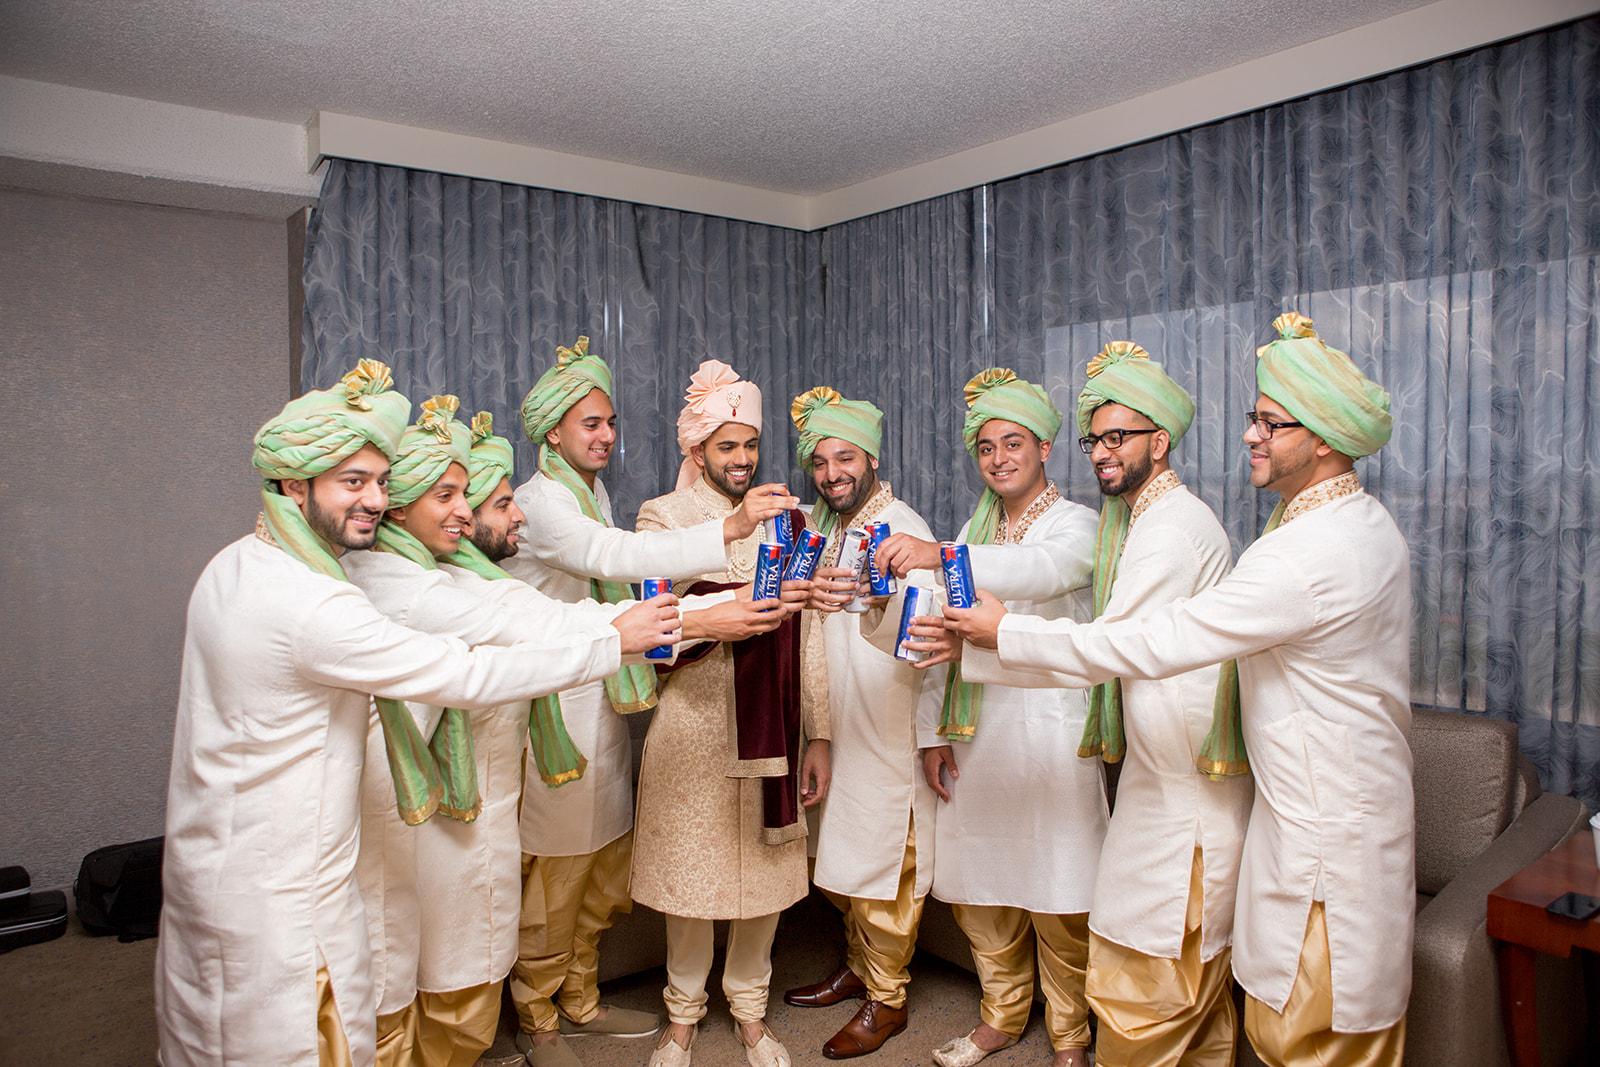 Le Cape Weddings - Puja and Kheelan - Getting Ready Groom-41.jpg